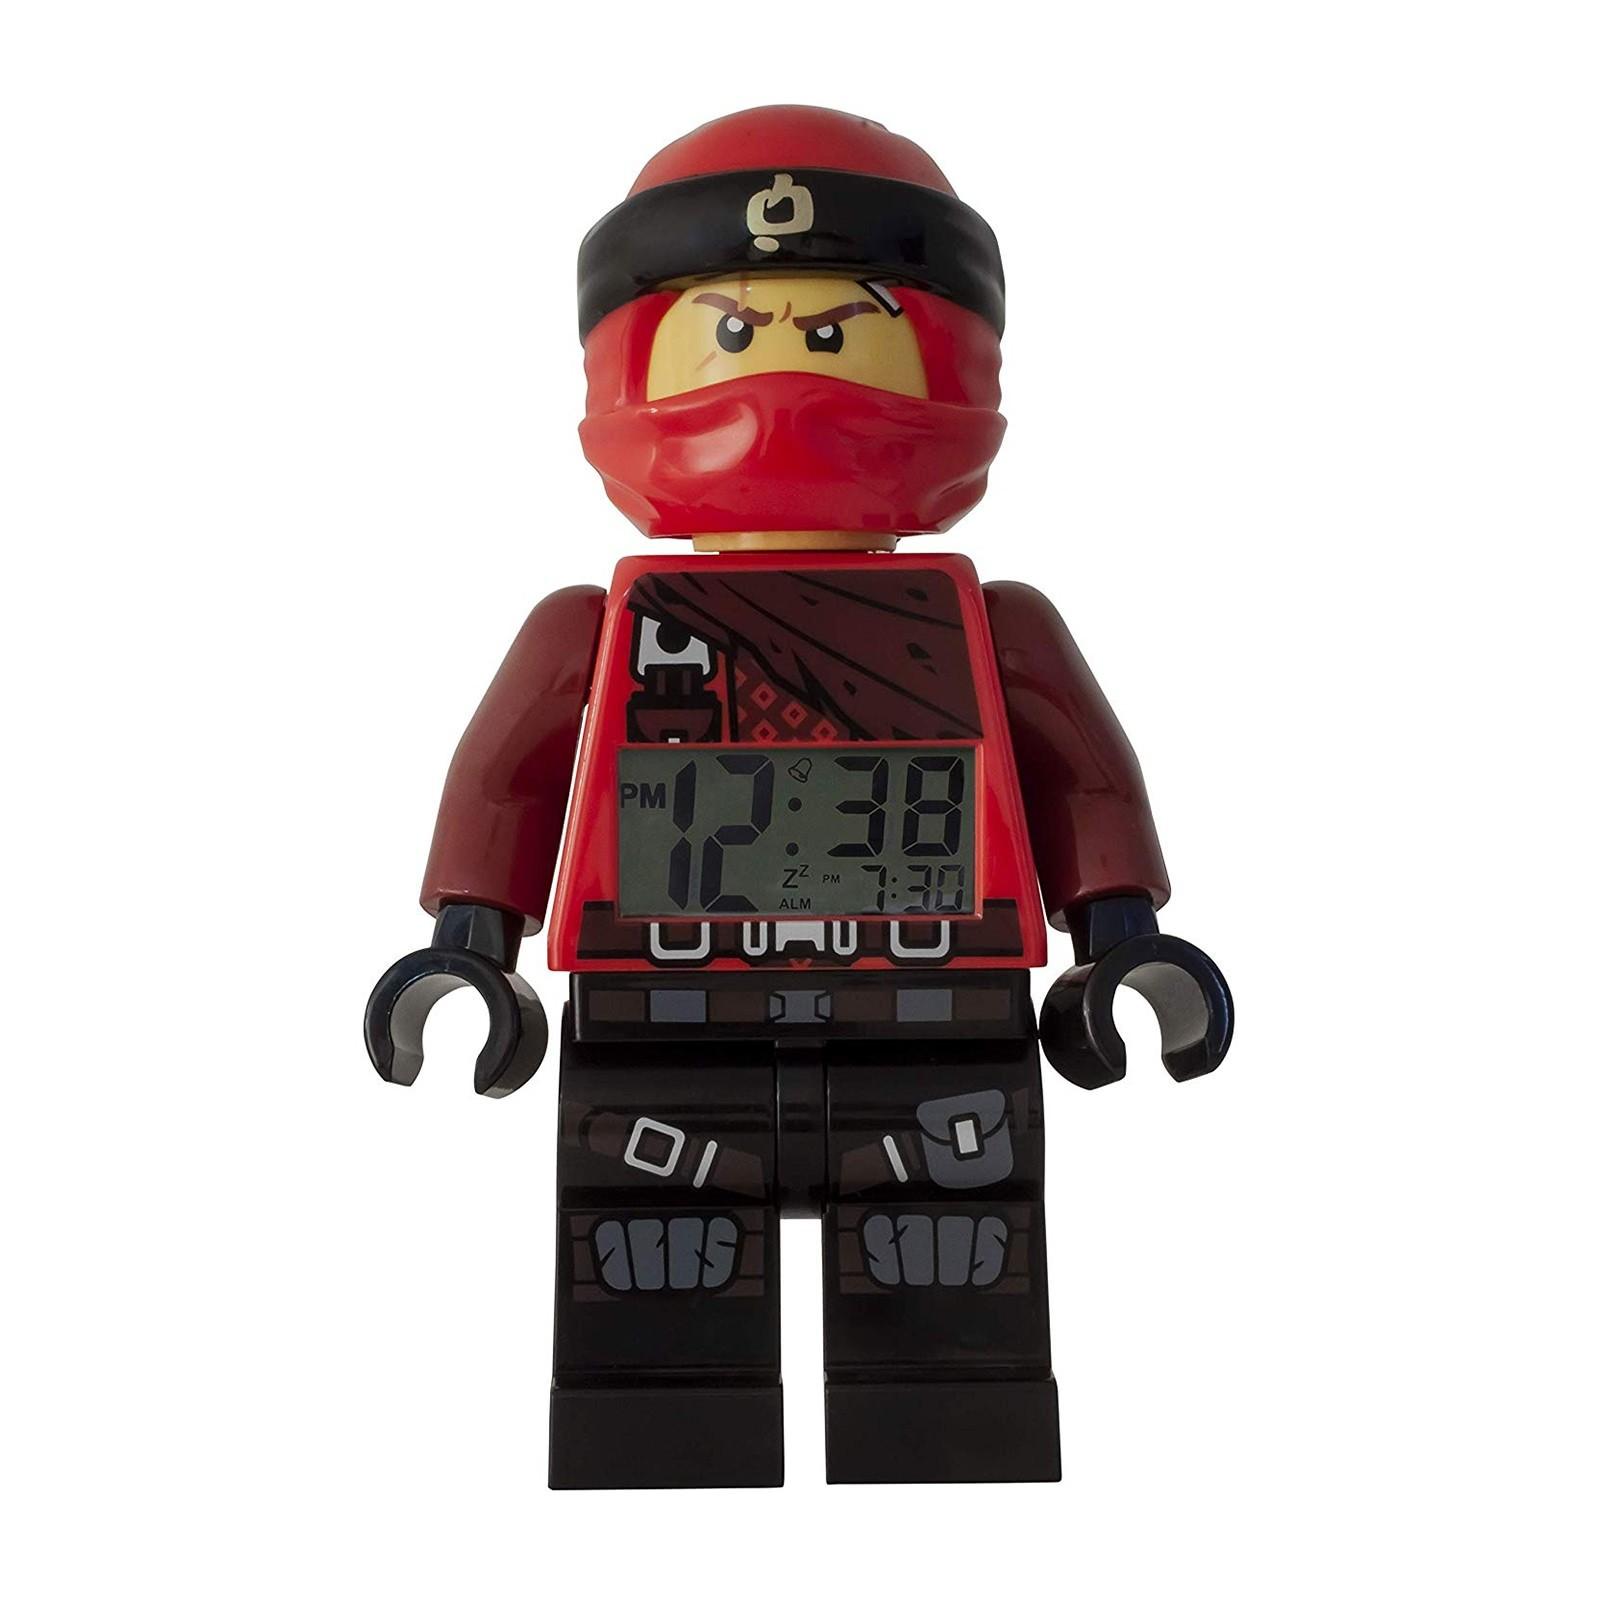 LEGO Ninjago Kai Figur Uhr 9009181 Kinder Digital Wecker ULE9009181